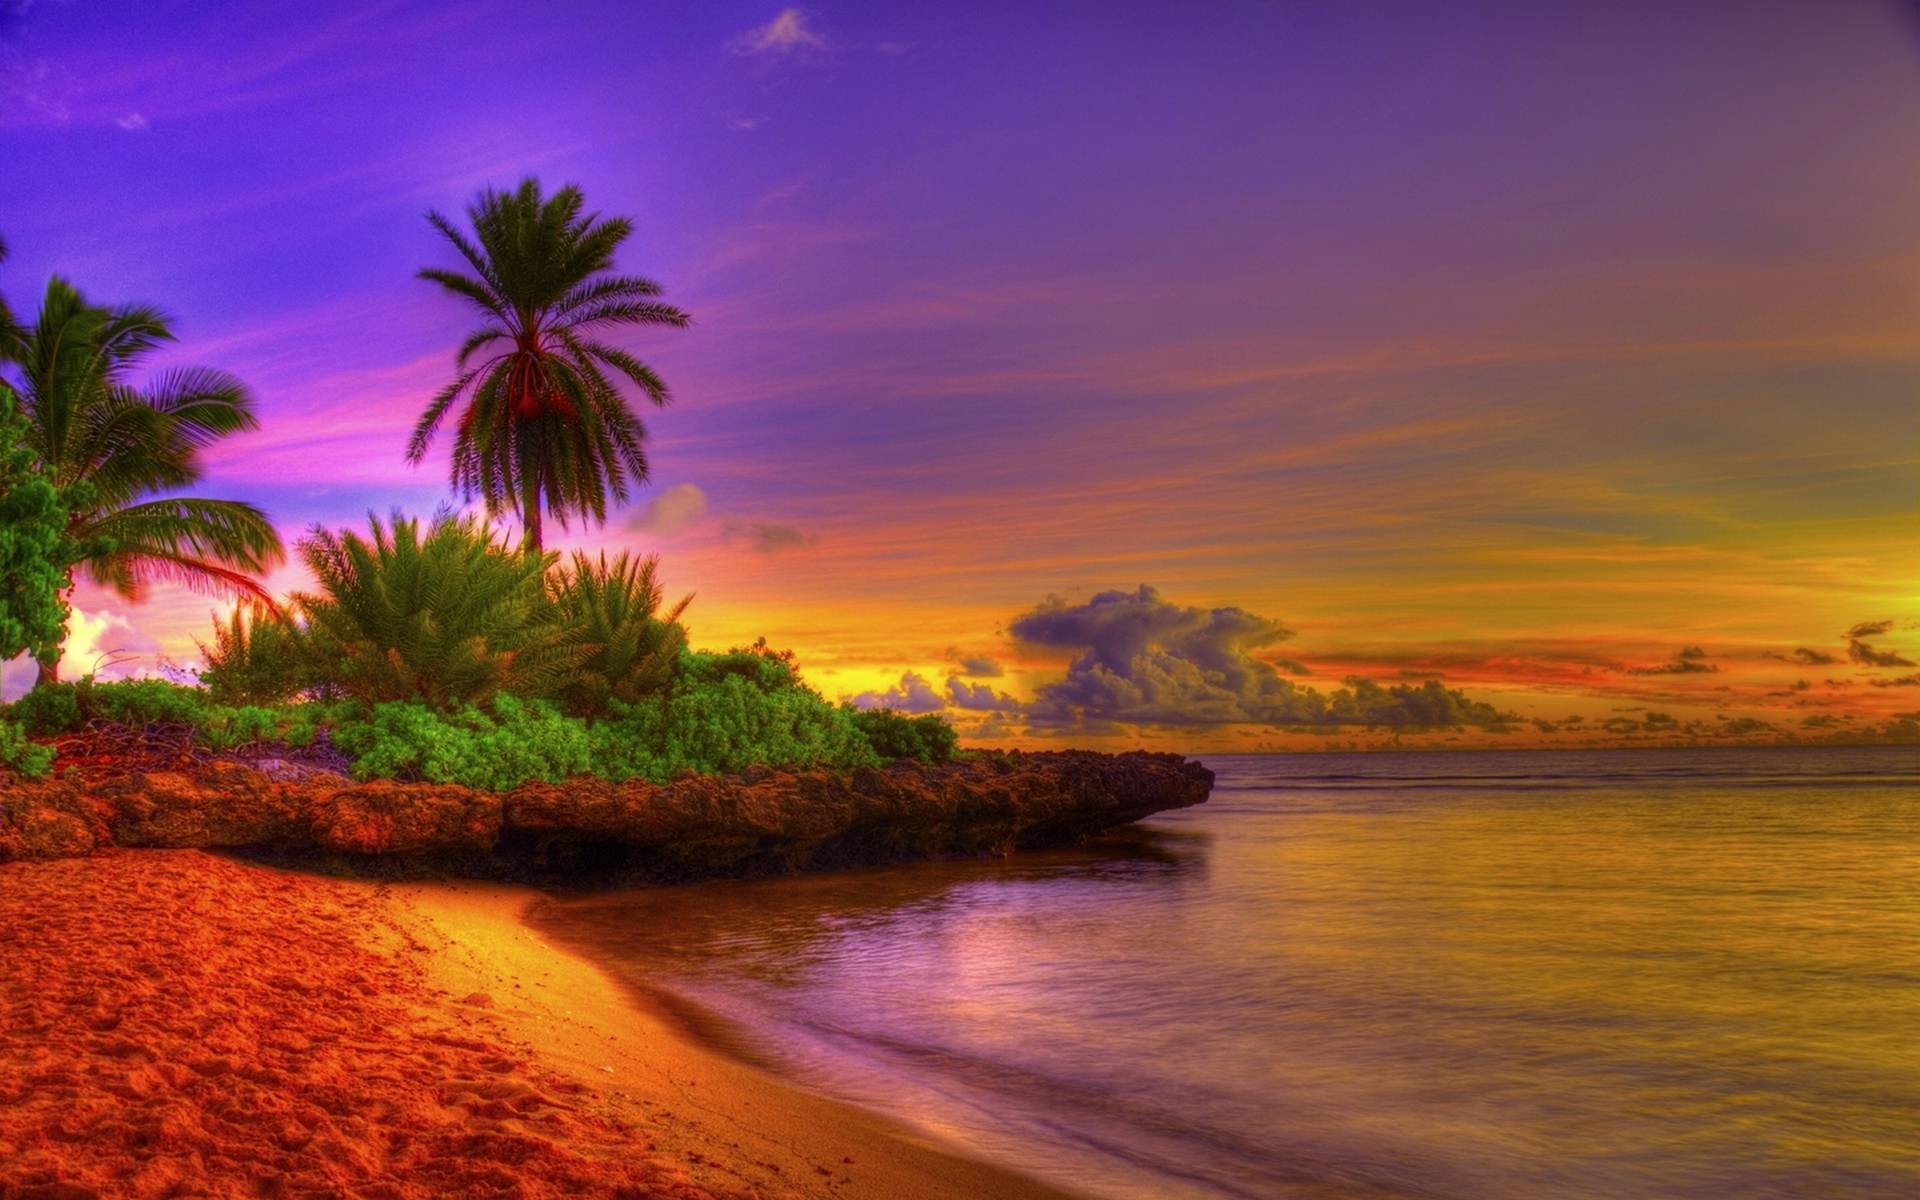 Beach Sunrise Wallpaper - WallpaperSafari